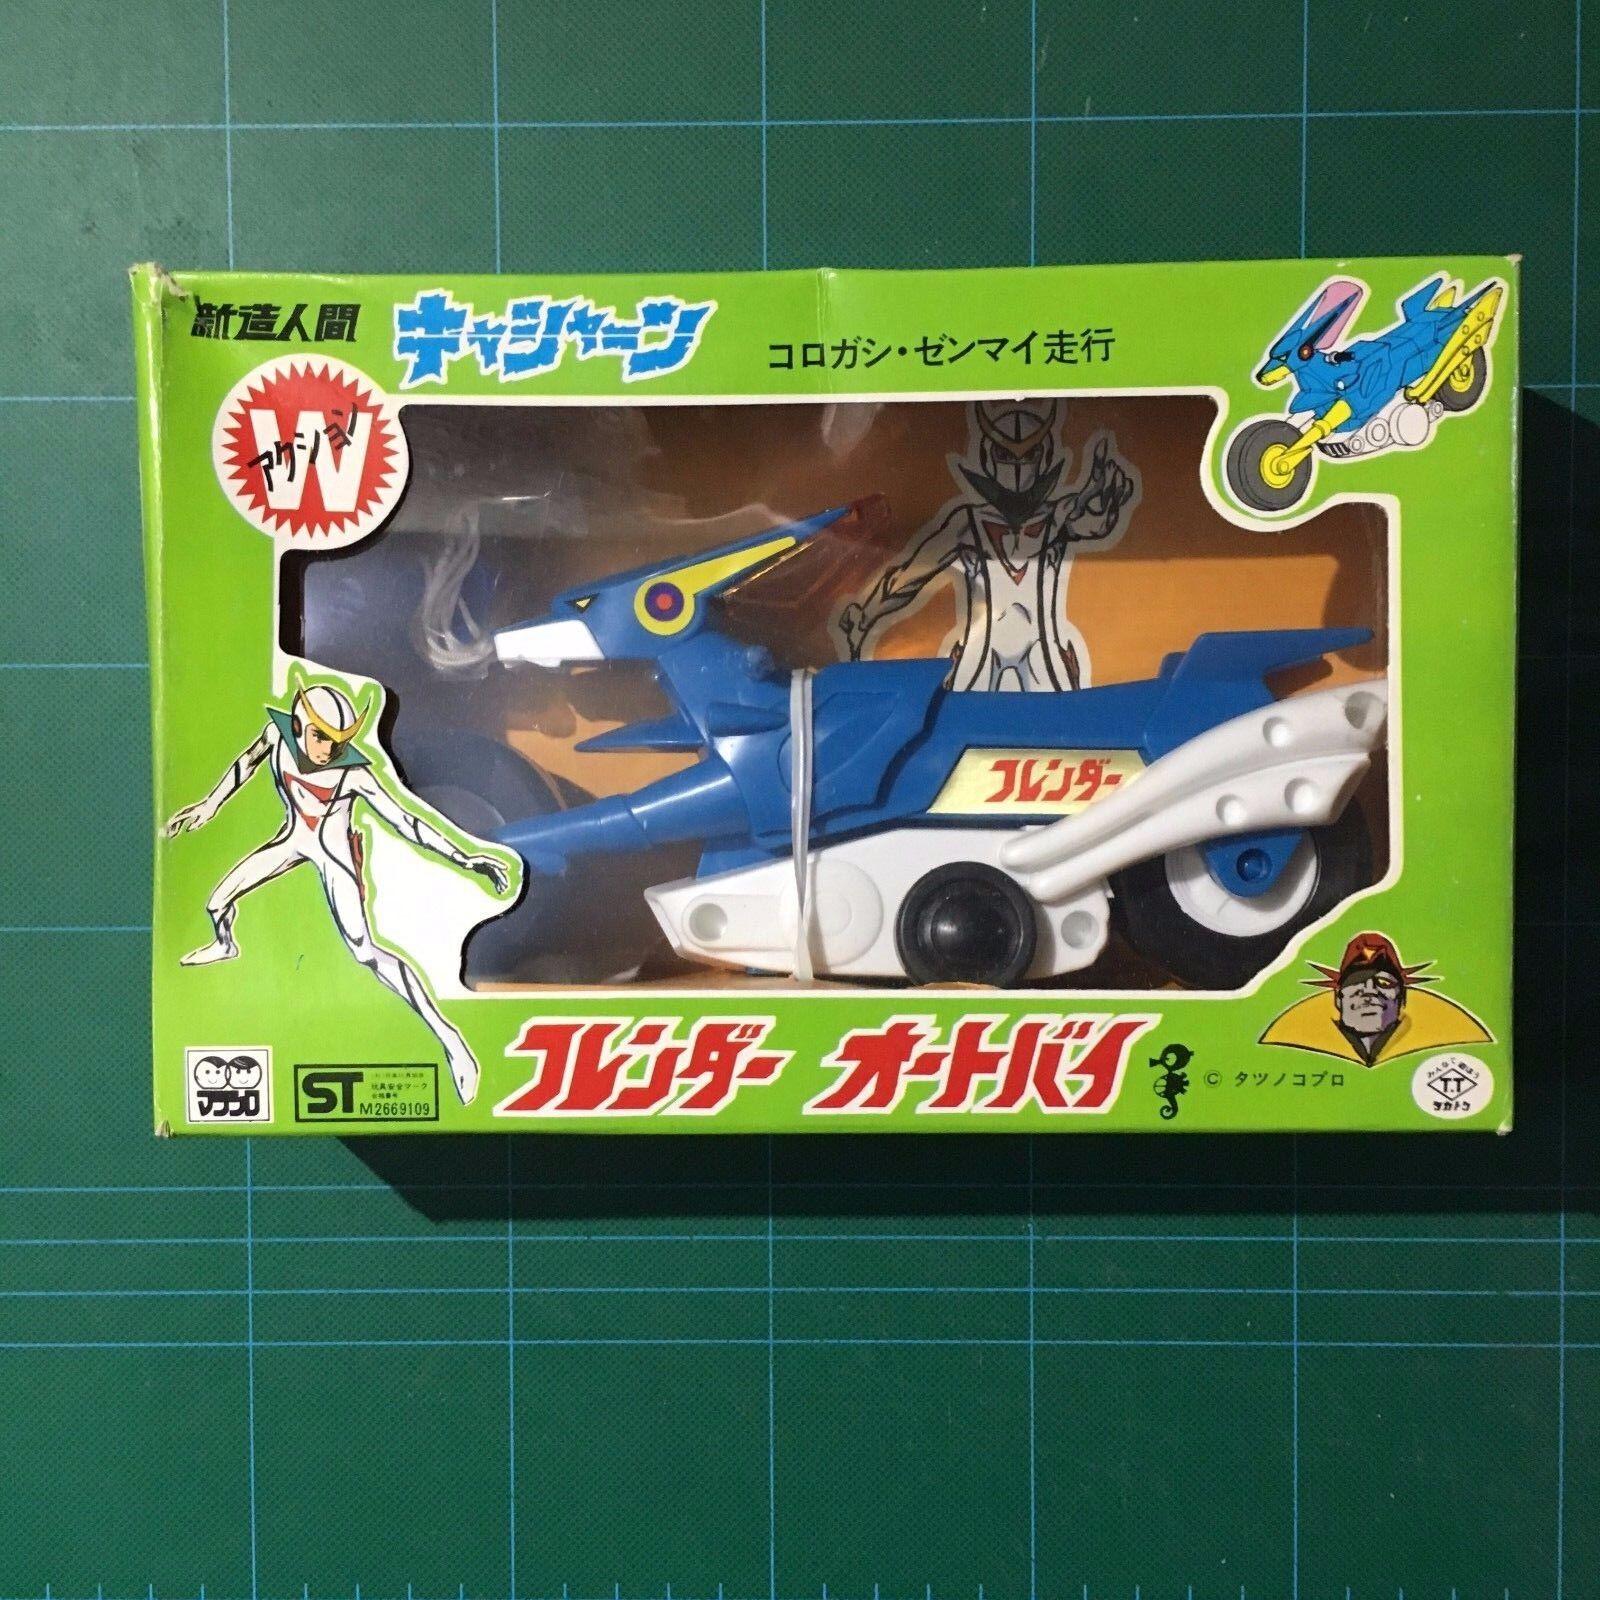 KYASHAN CHASSAN BELLISSIMO FLENDER VINTAGE Bike Anime Japan